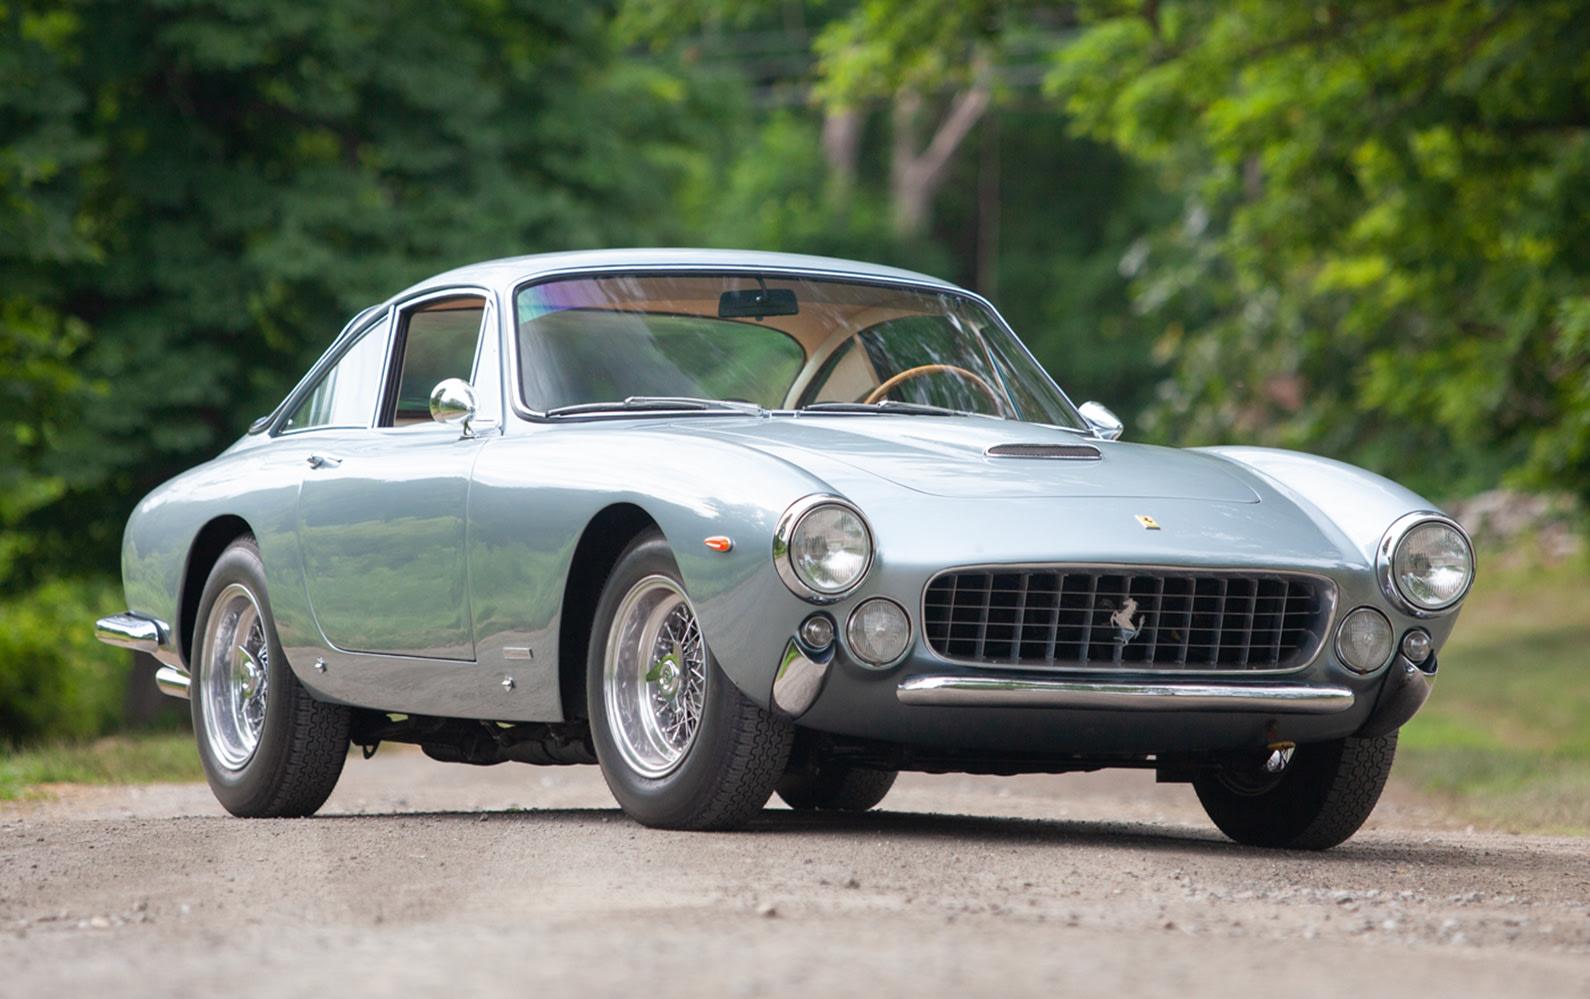 1964 Ferrari 250 GT Lusso (2)